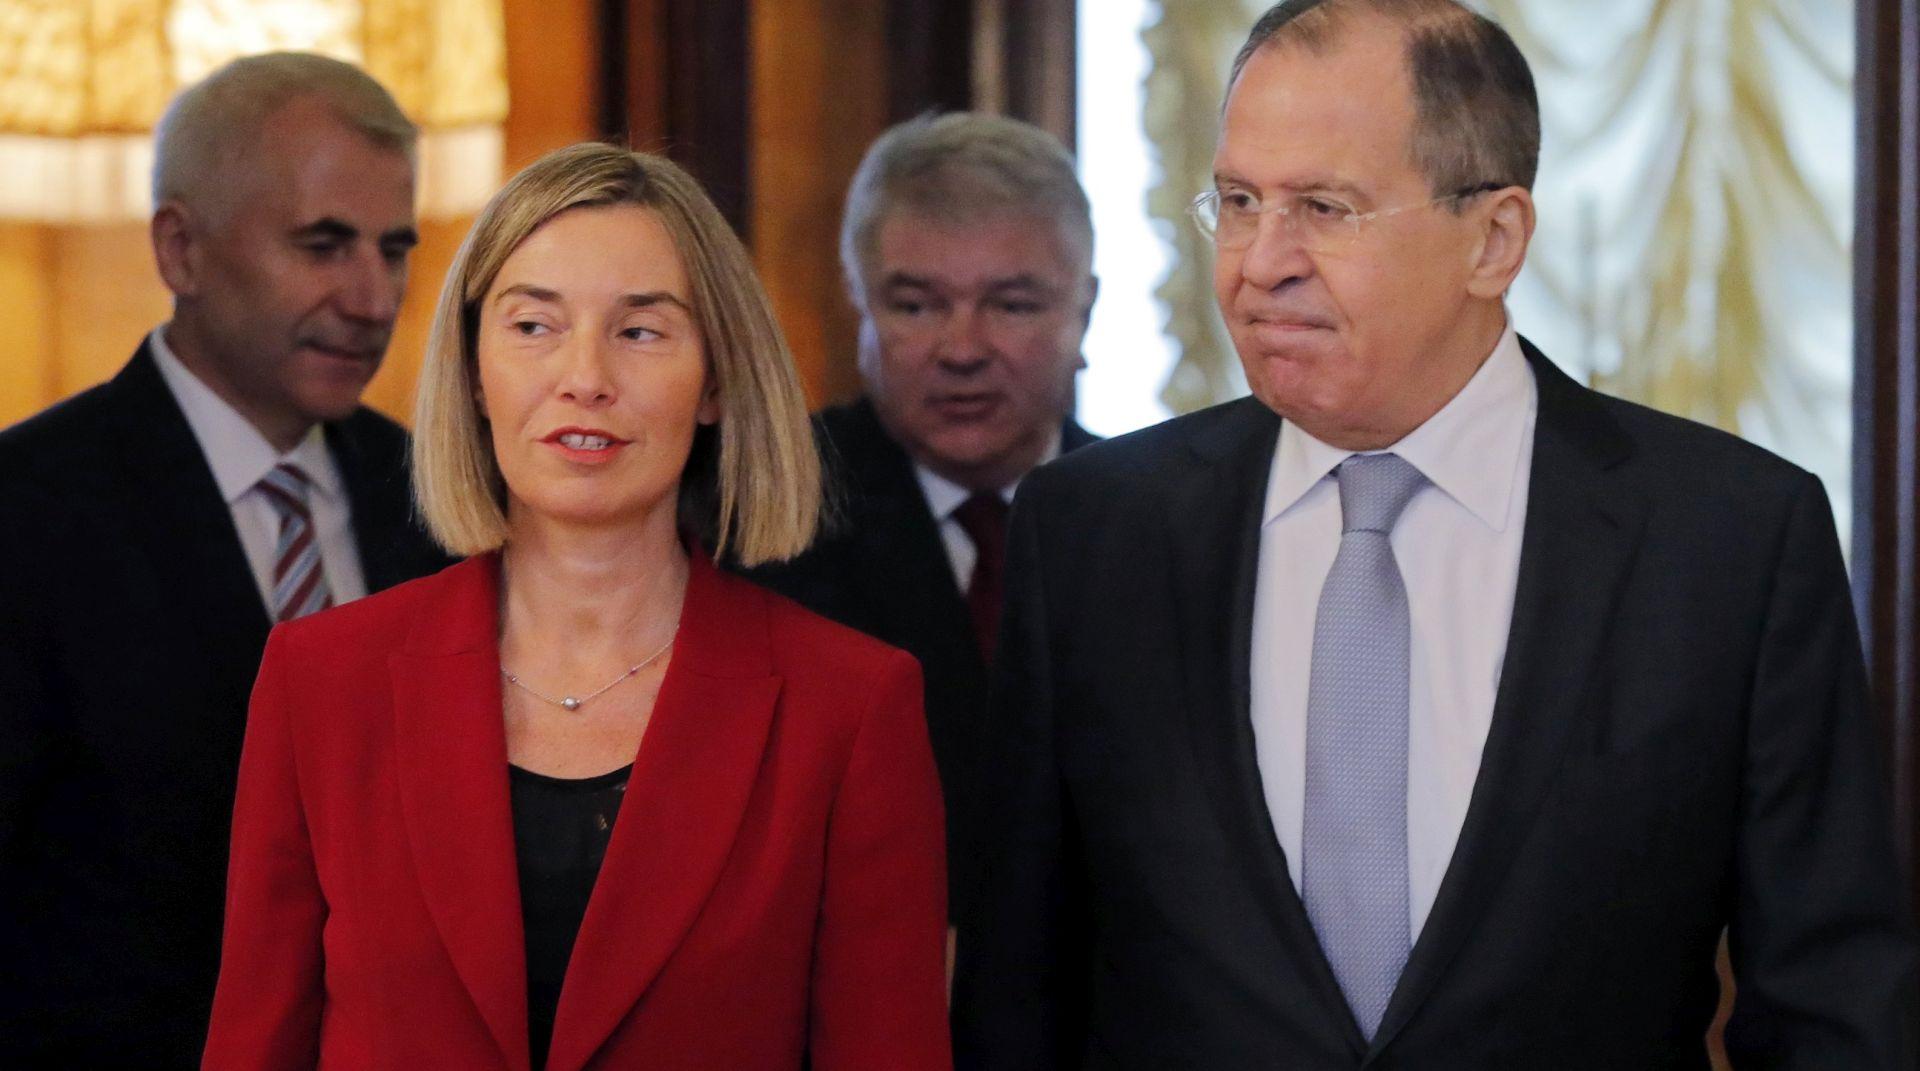 UKRAJNA Istraga o smrti promatrača; Mogherini i Lavrov za poštivanje sporazuma